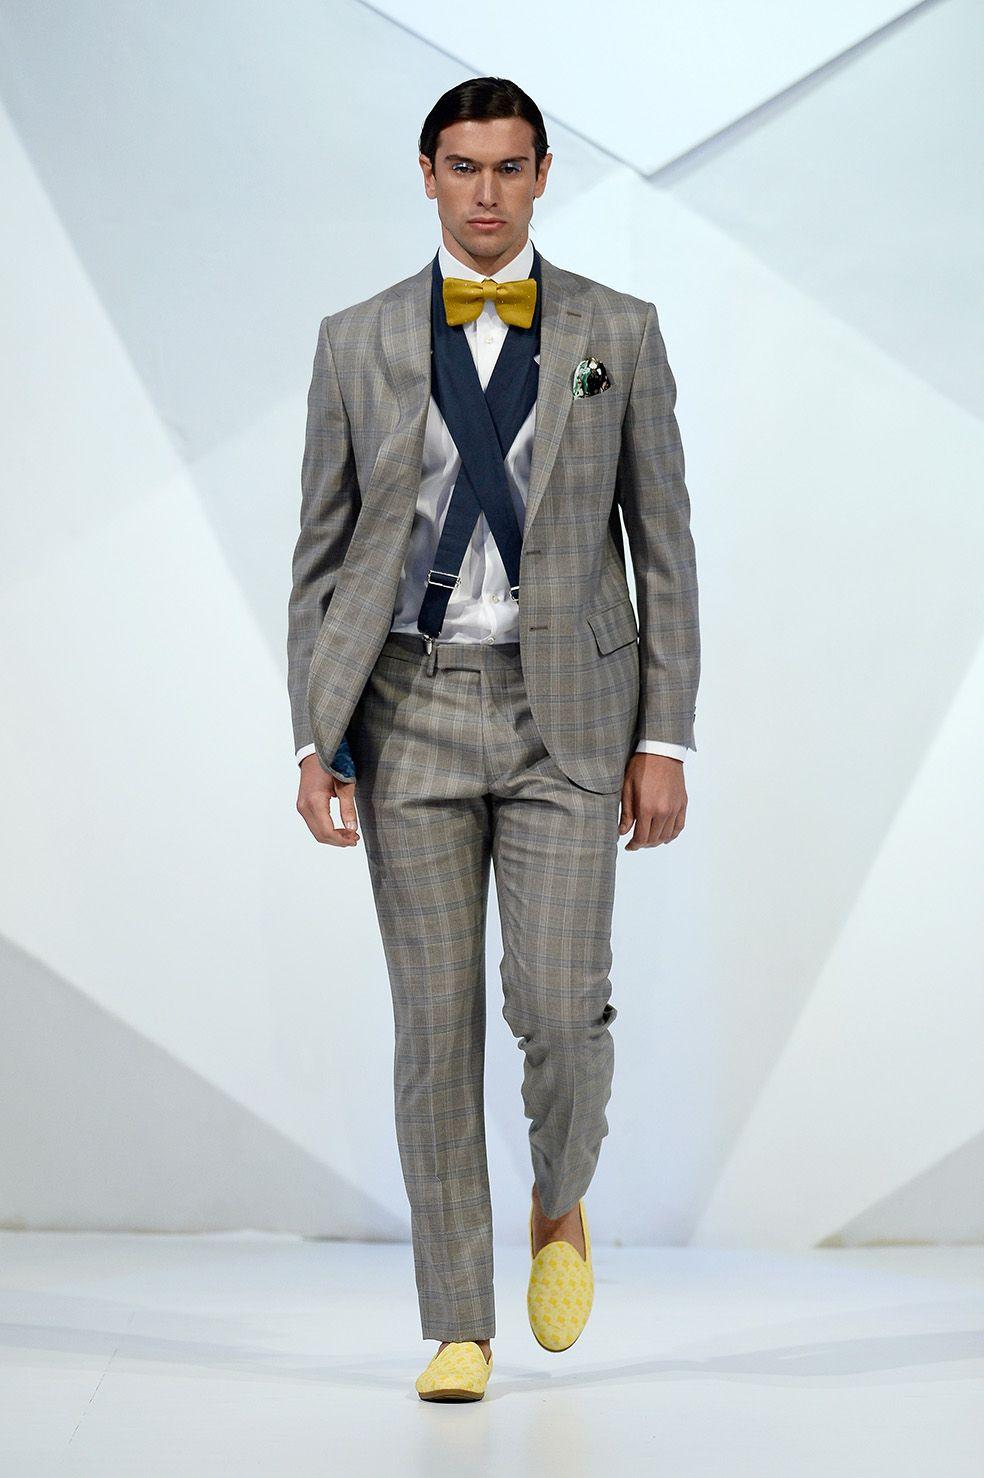 winter tuxedo Google Search Fashion, Summer wear, Fall